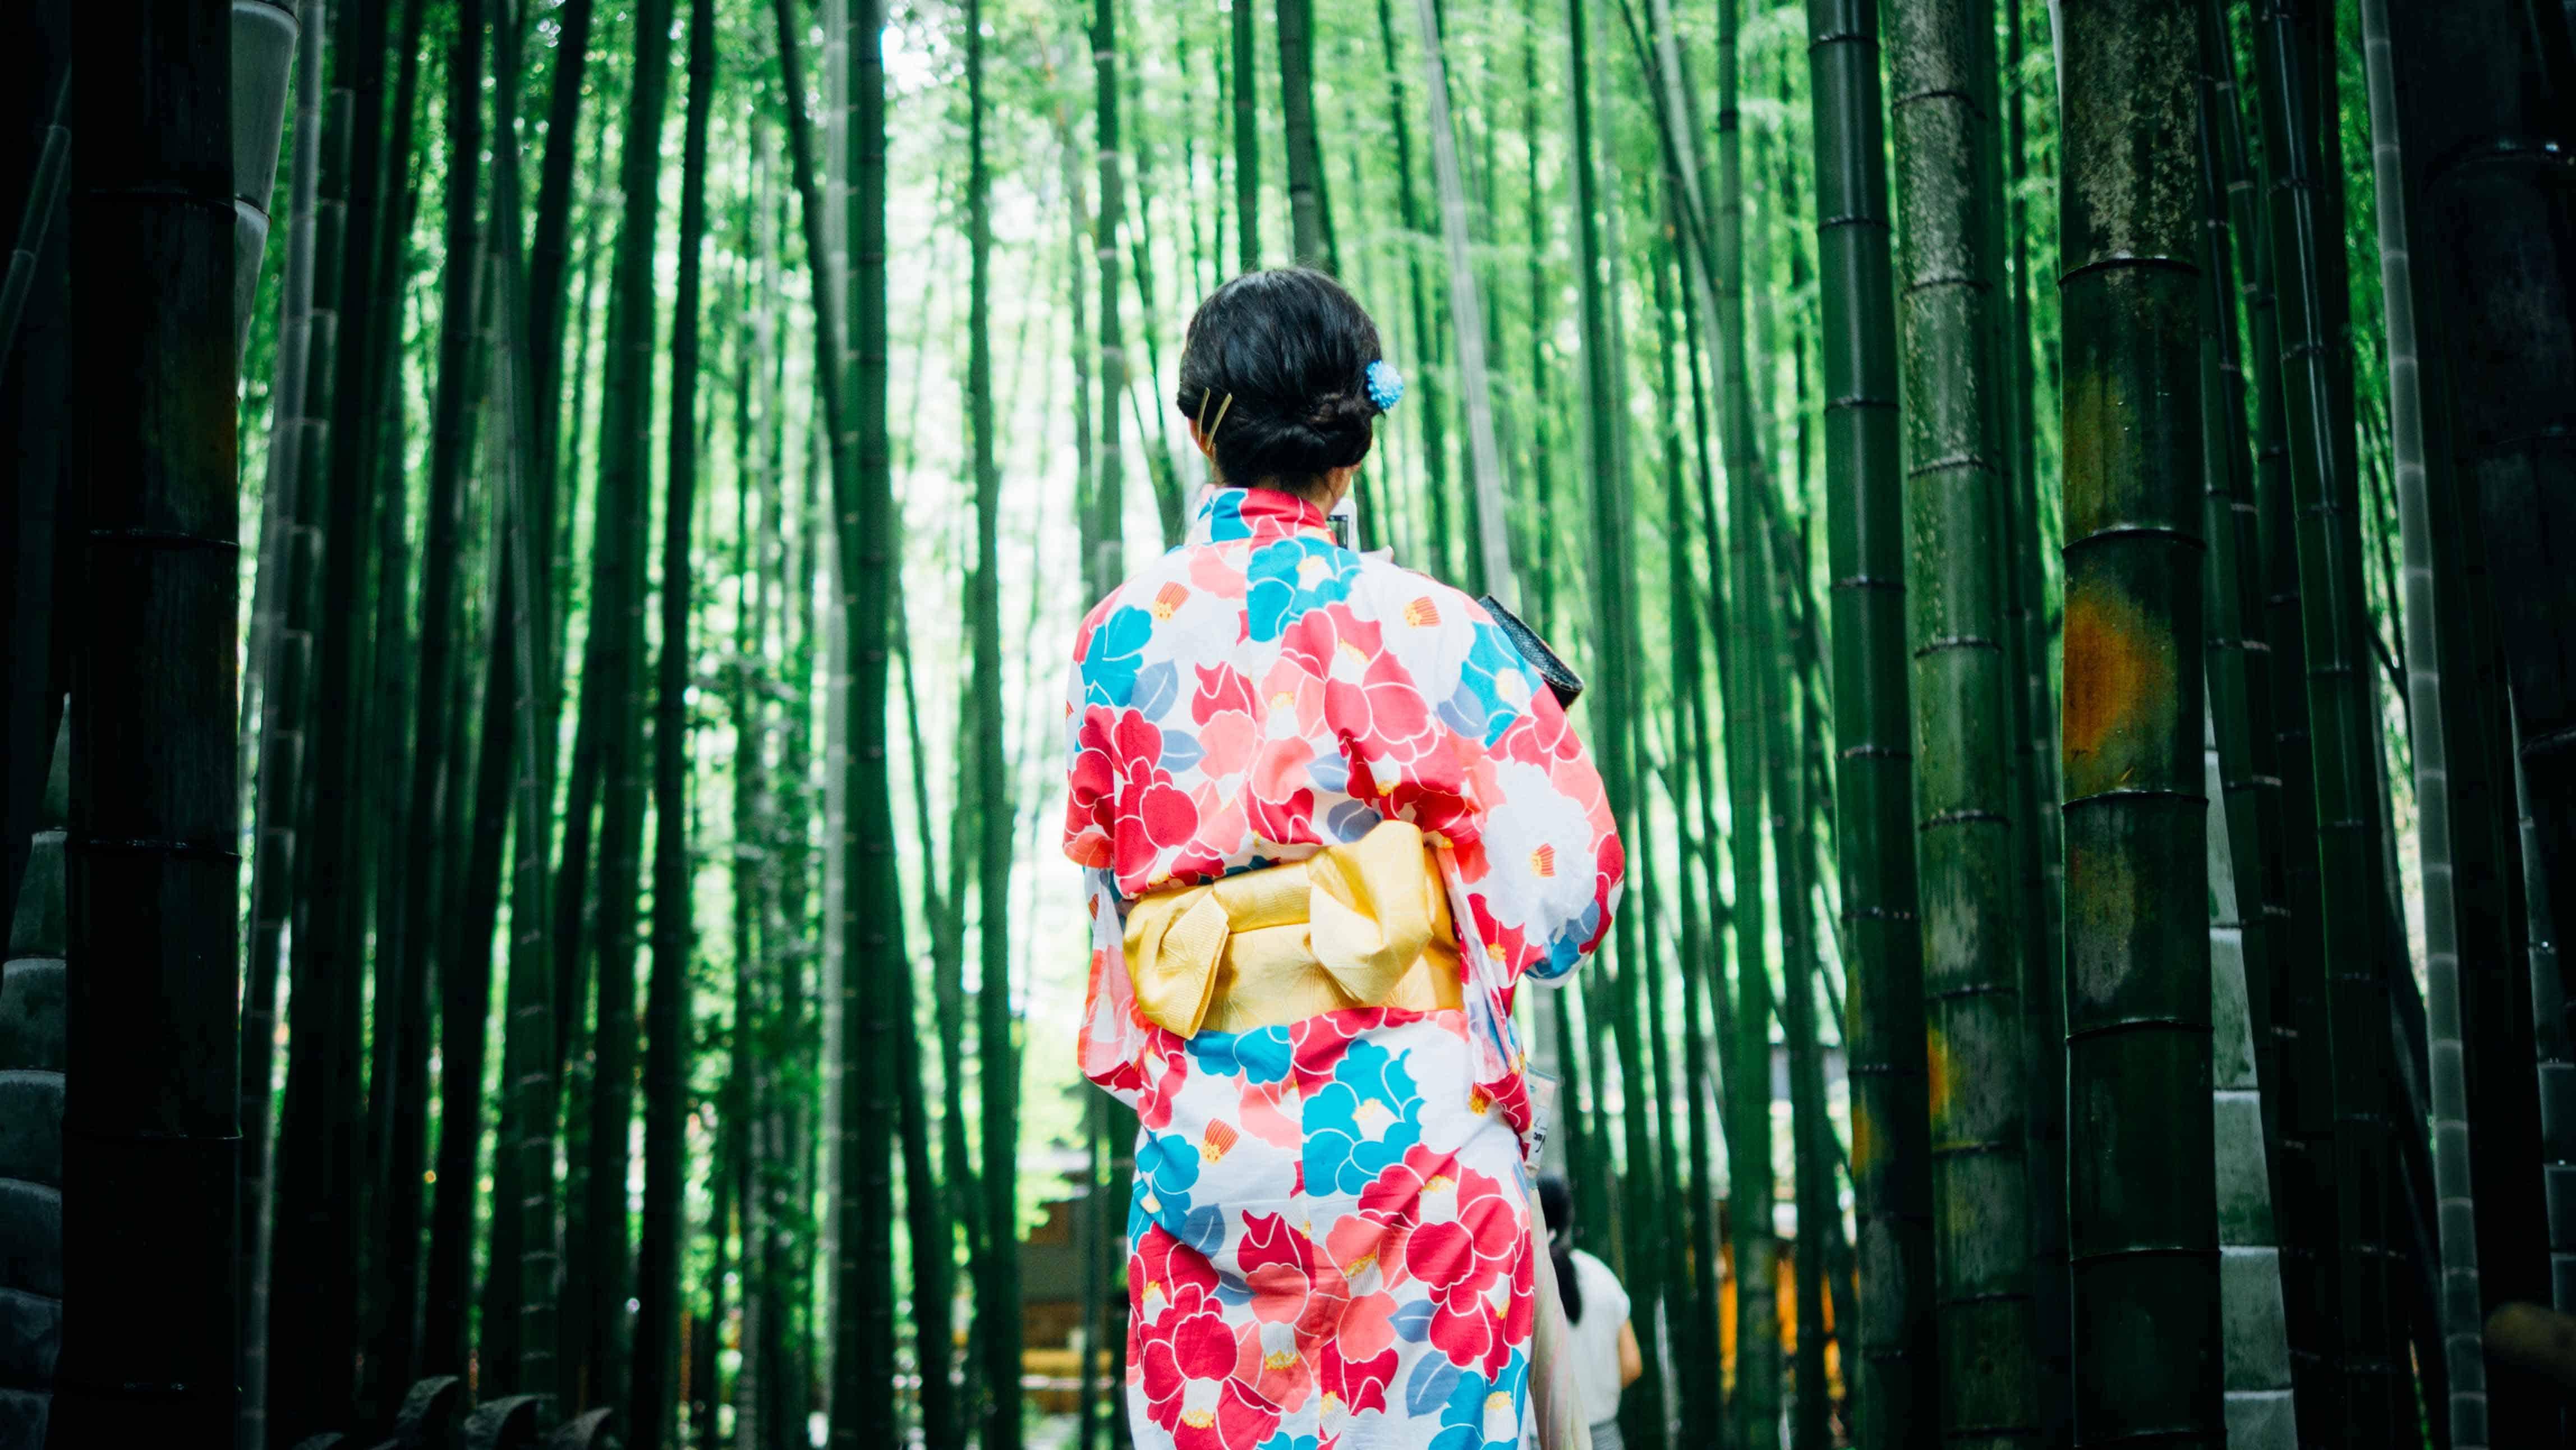 kimono girl in bamboo forest - japanese for beginners